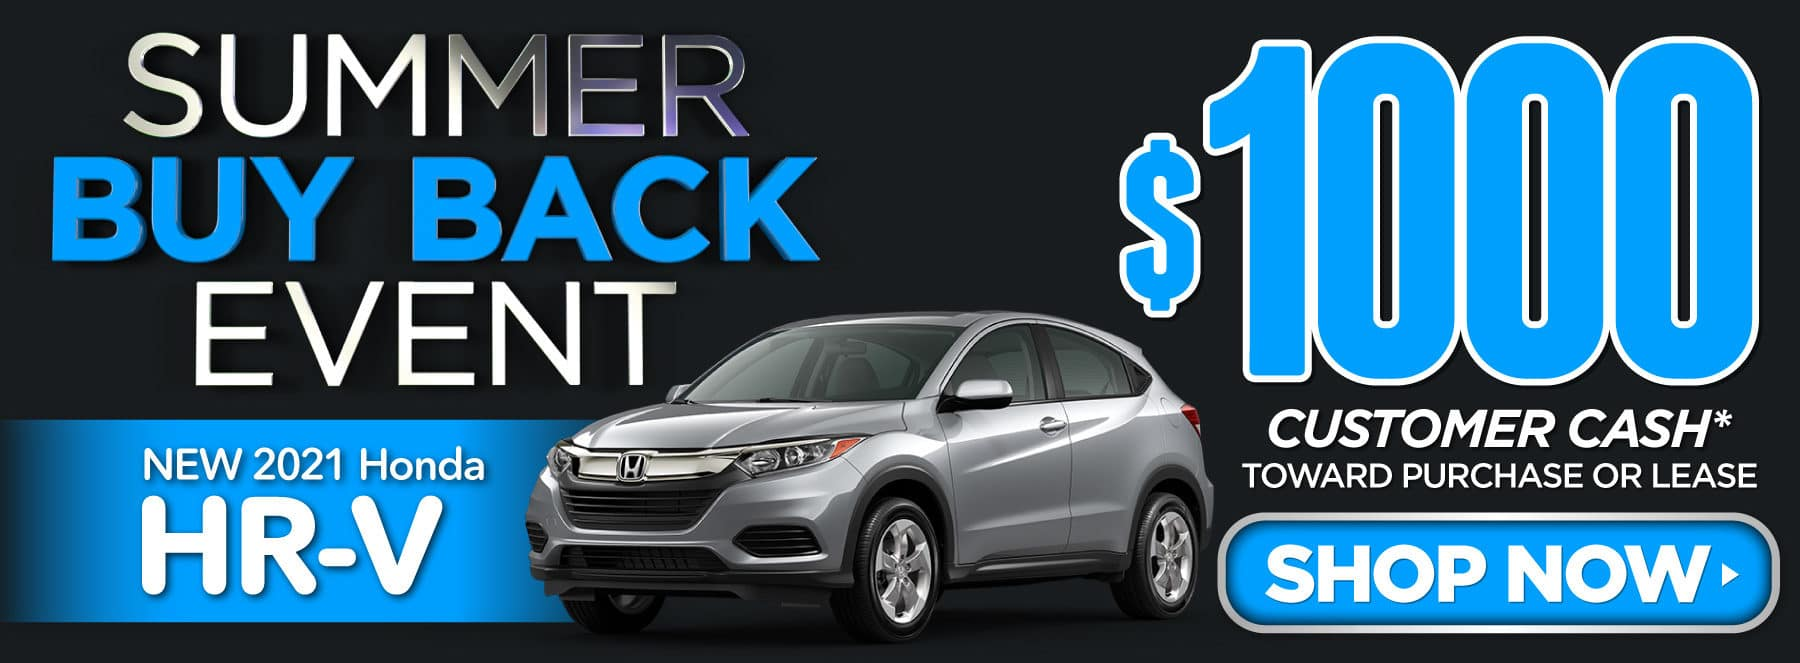 New 2021 Honda HR-V - $1000 Customer Cash - Shop Now